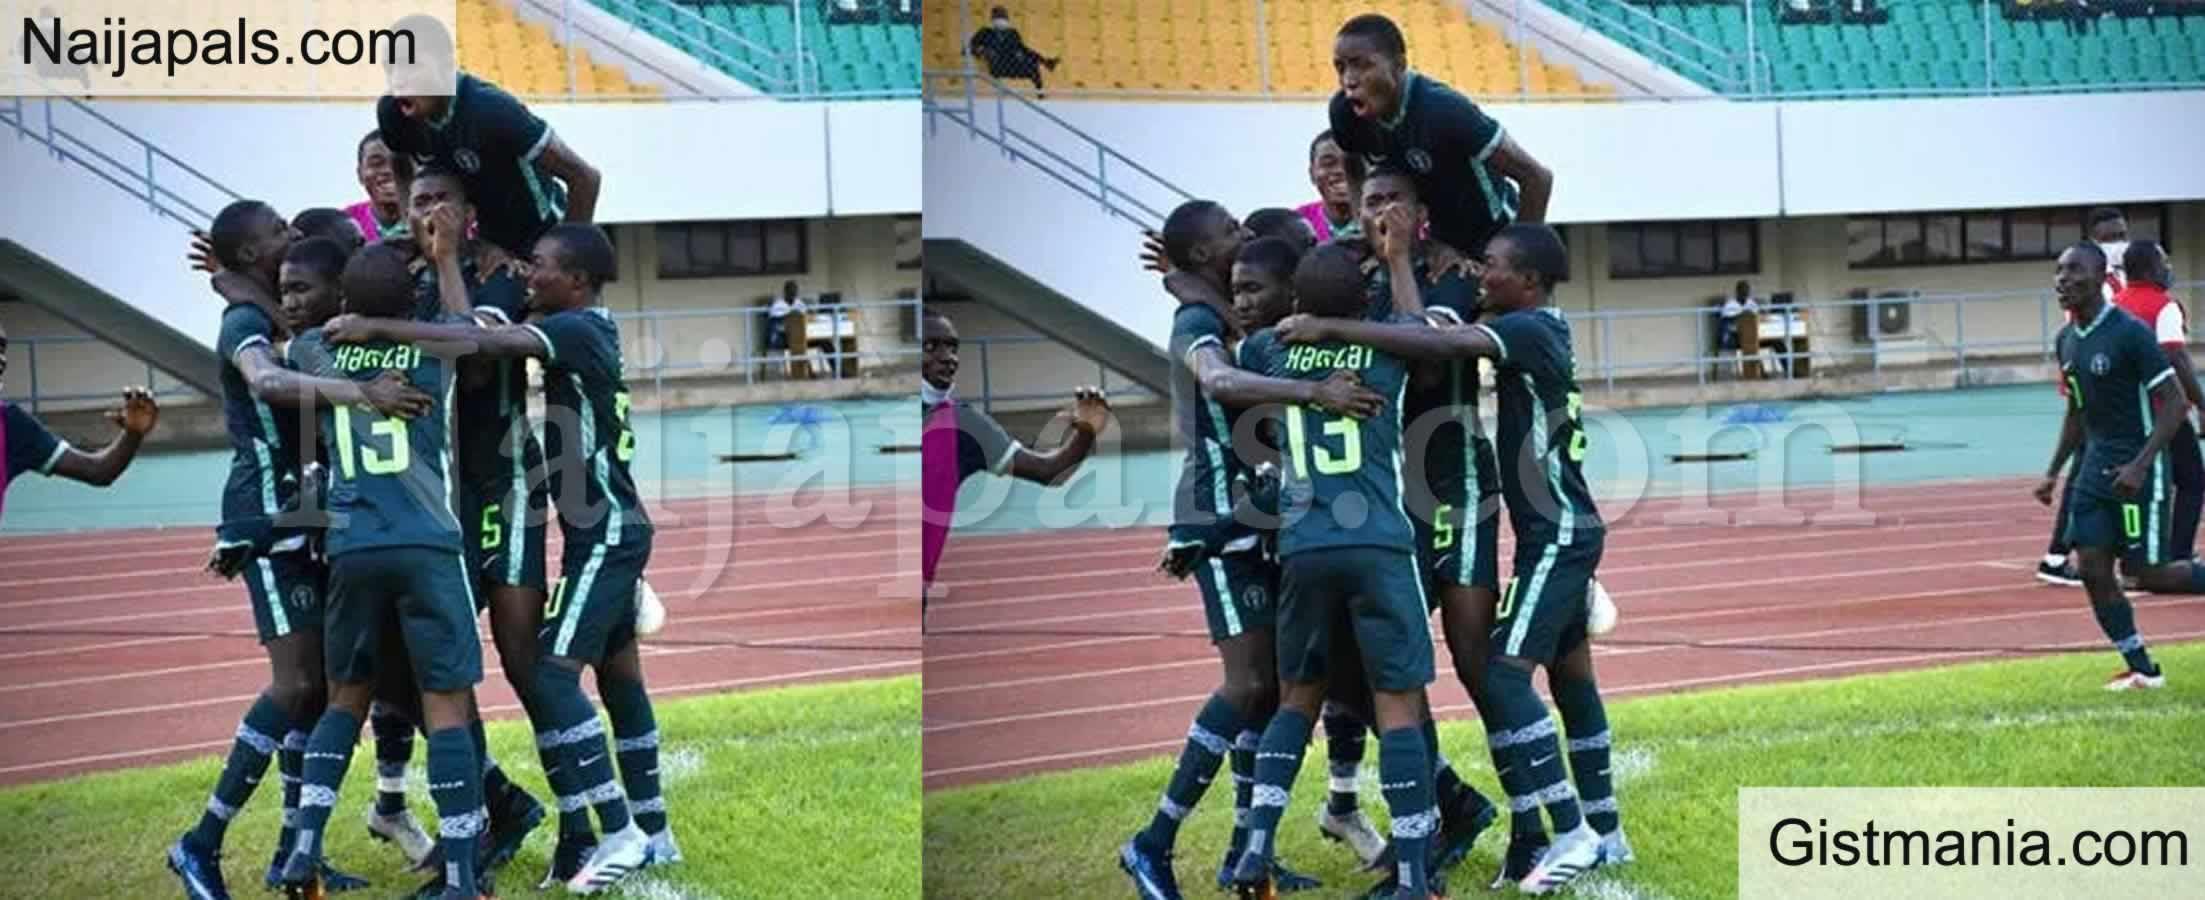 <img alt='.' class='lazyload' data-src='https://img.gistmania.com/emot/soccer.gif' /> <b>Nigeria U-17 Qualifies For WAFU Cup Final After Defeating Burkina Faso</b>